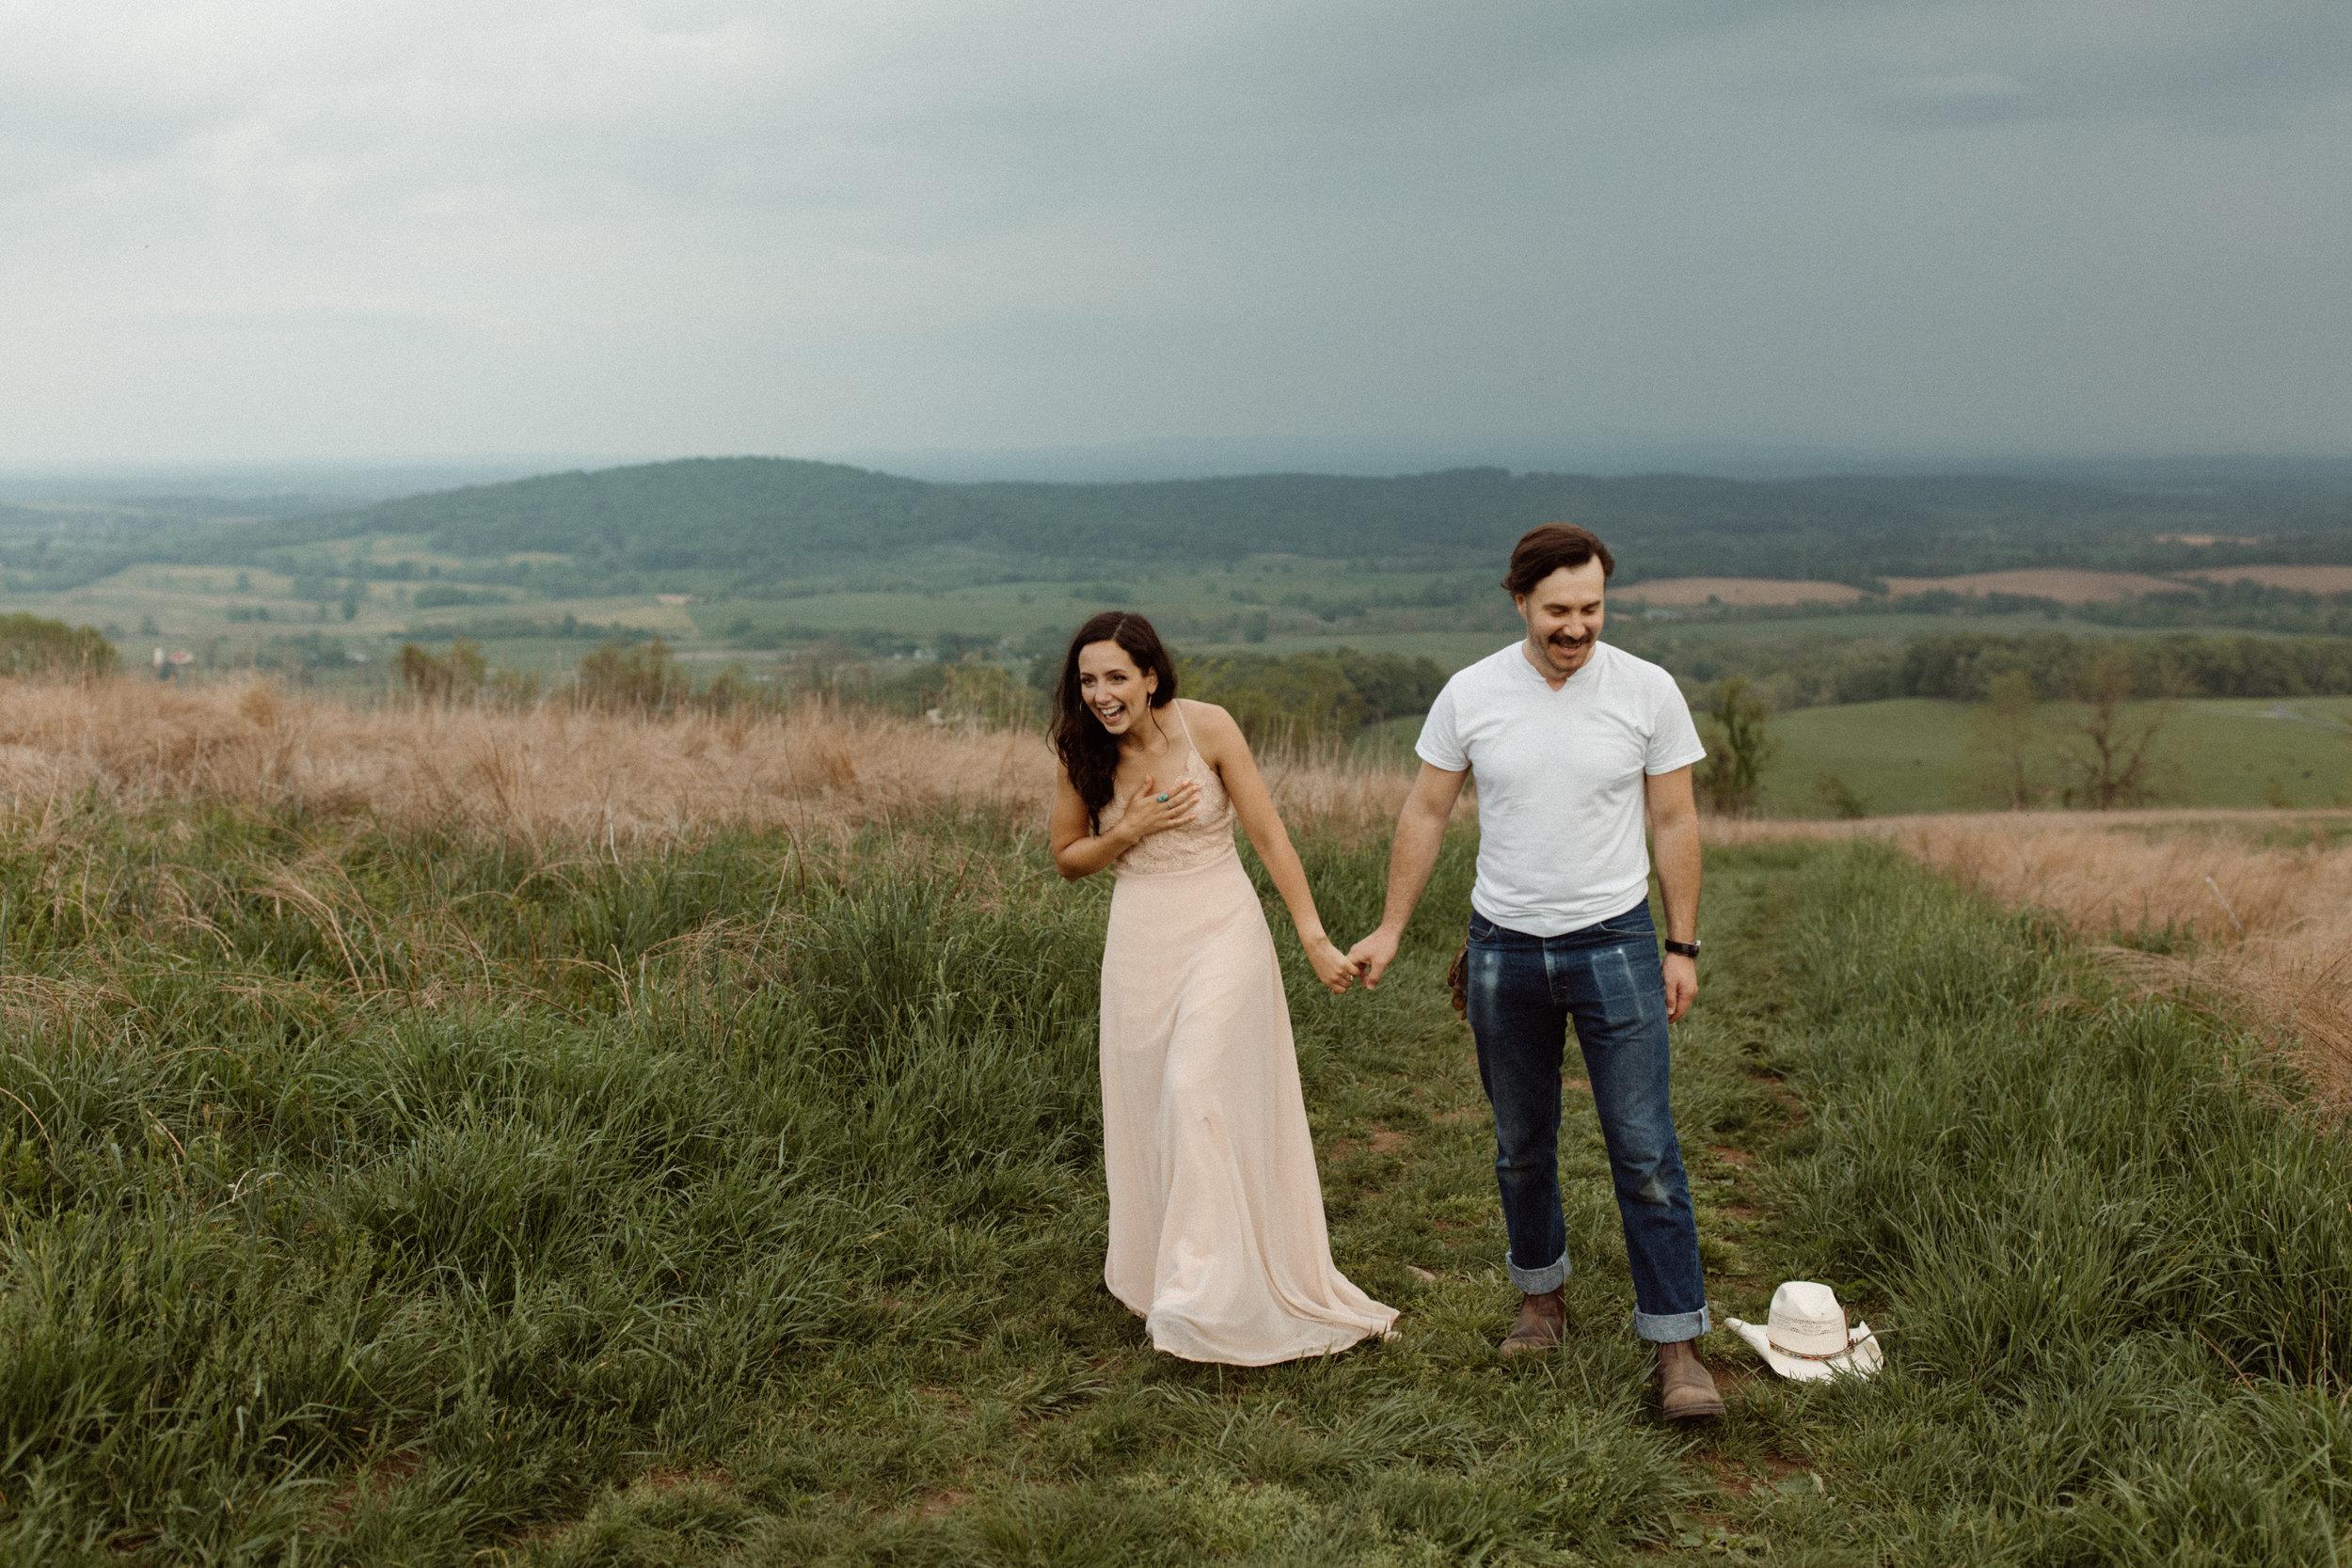 kelsey&mark-engagement-skymeadows-2019-peytoncurry-9877.jpg